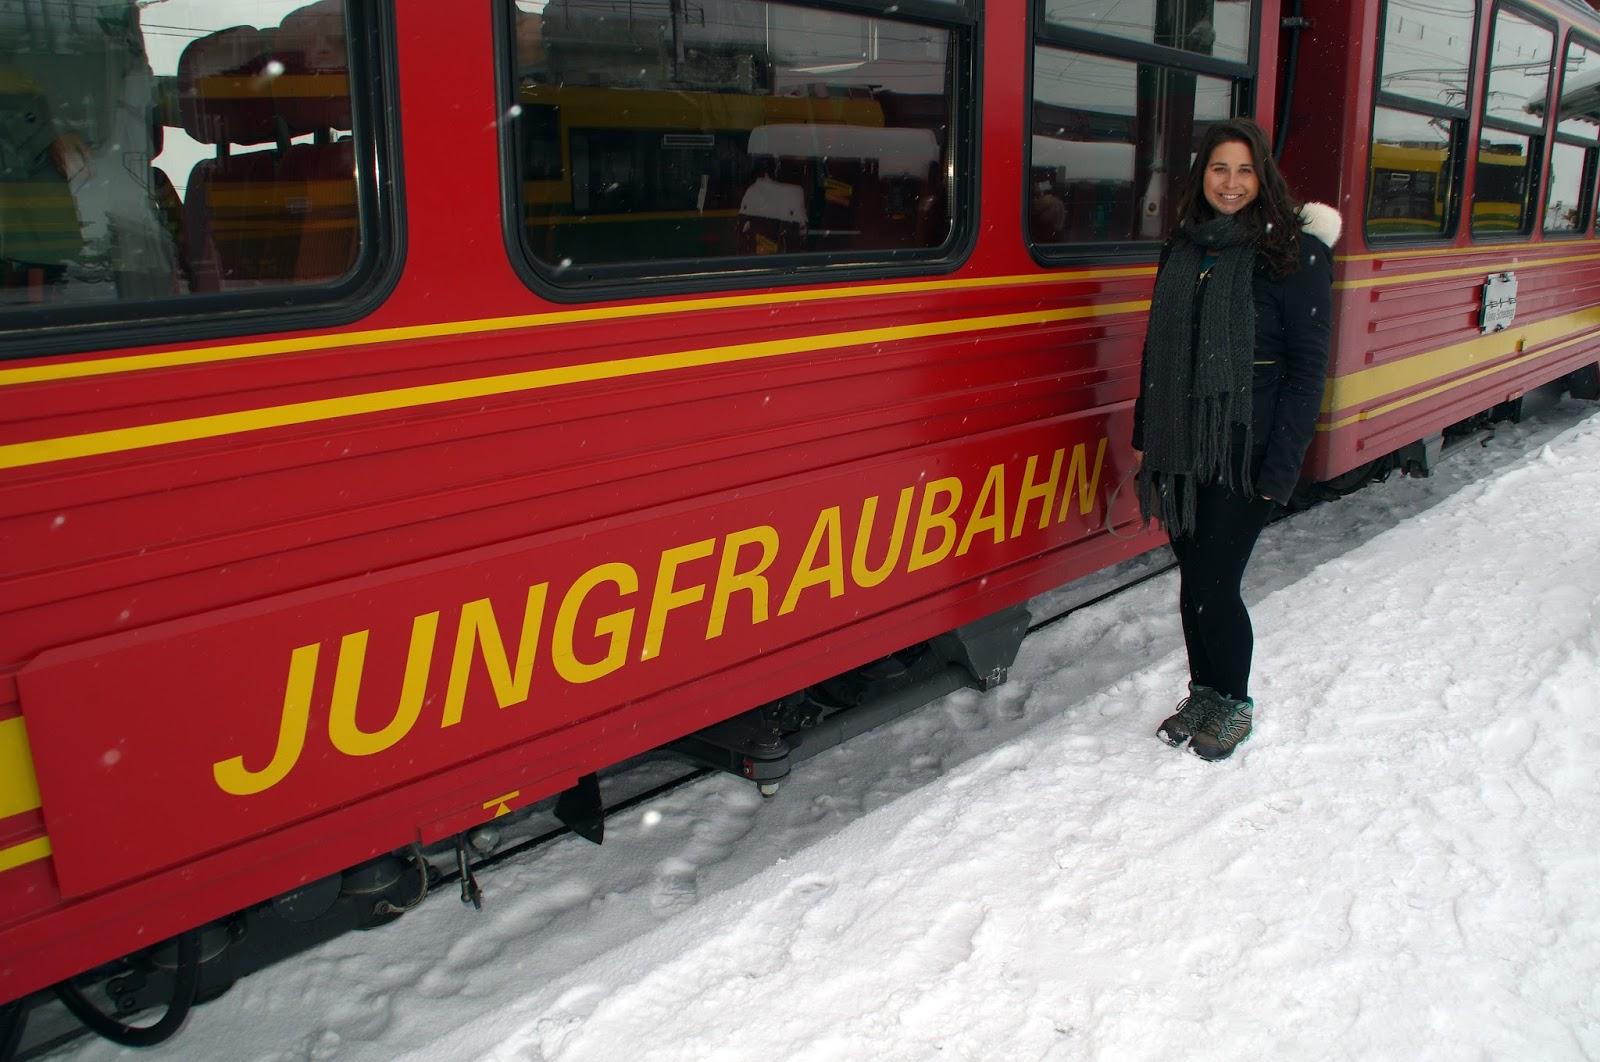 Jungfraujoch Train